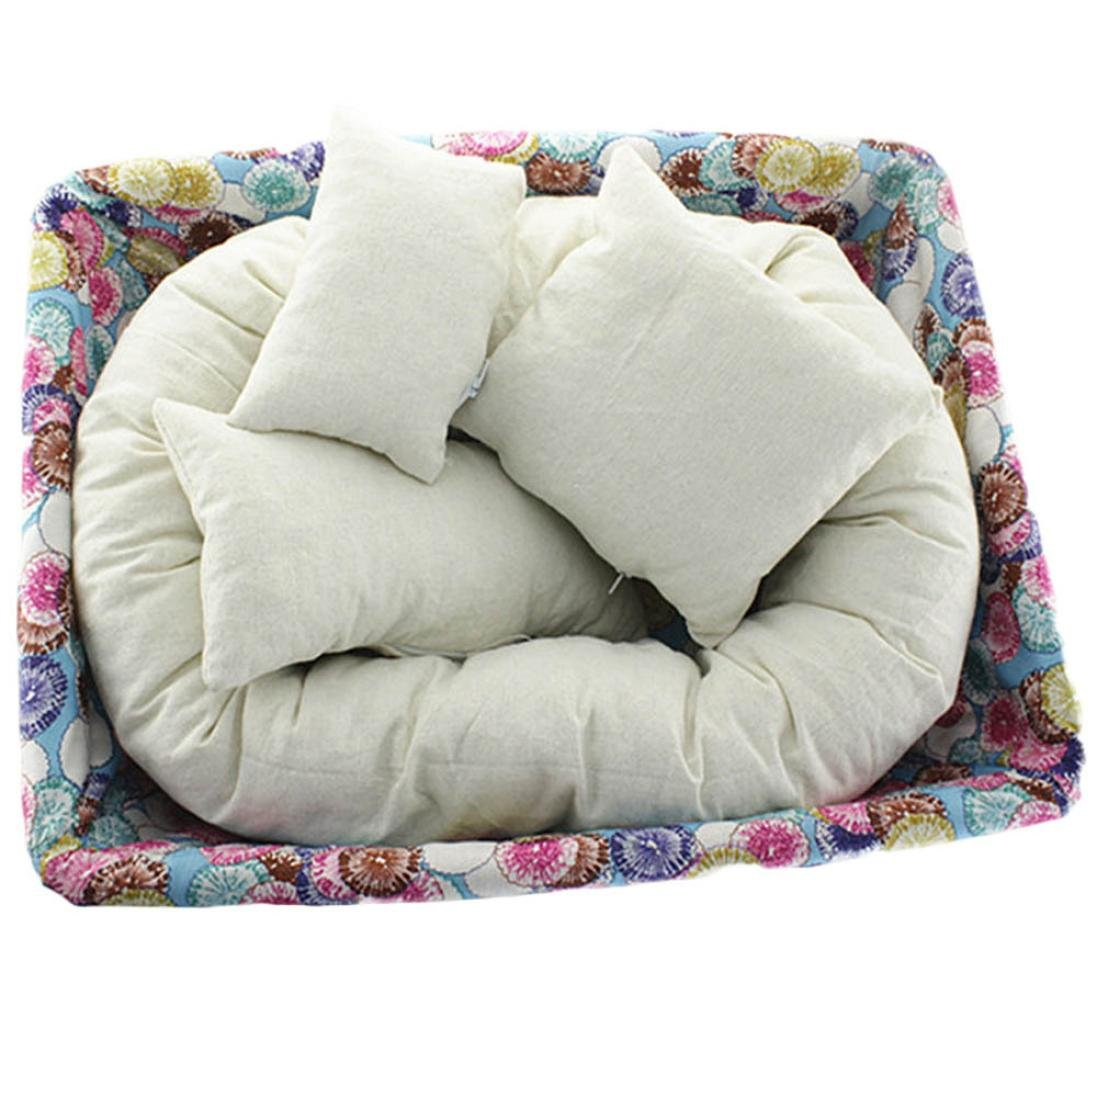 Baby Pillow - Kingwo child pillow 0-6 months baby Pillow toddler pillow 4 PC Newborn Photography Basket Filler Wheat Donut Posing Props Baby Pillow Echobaby